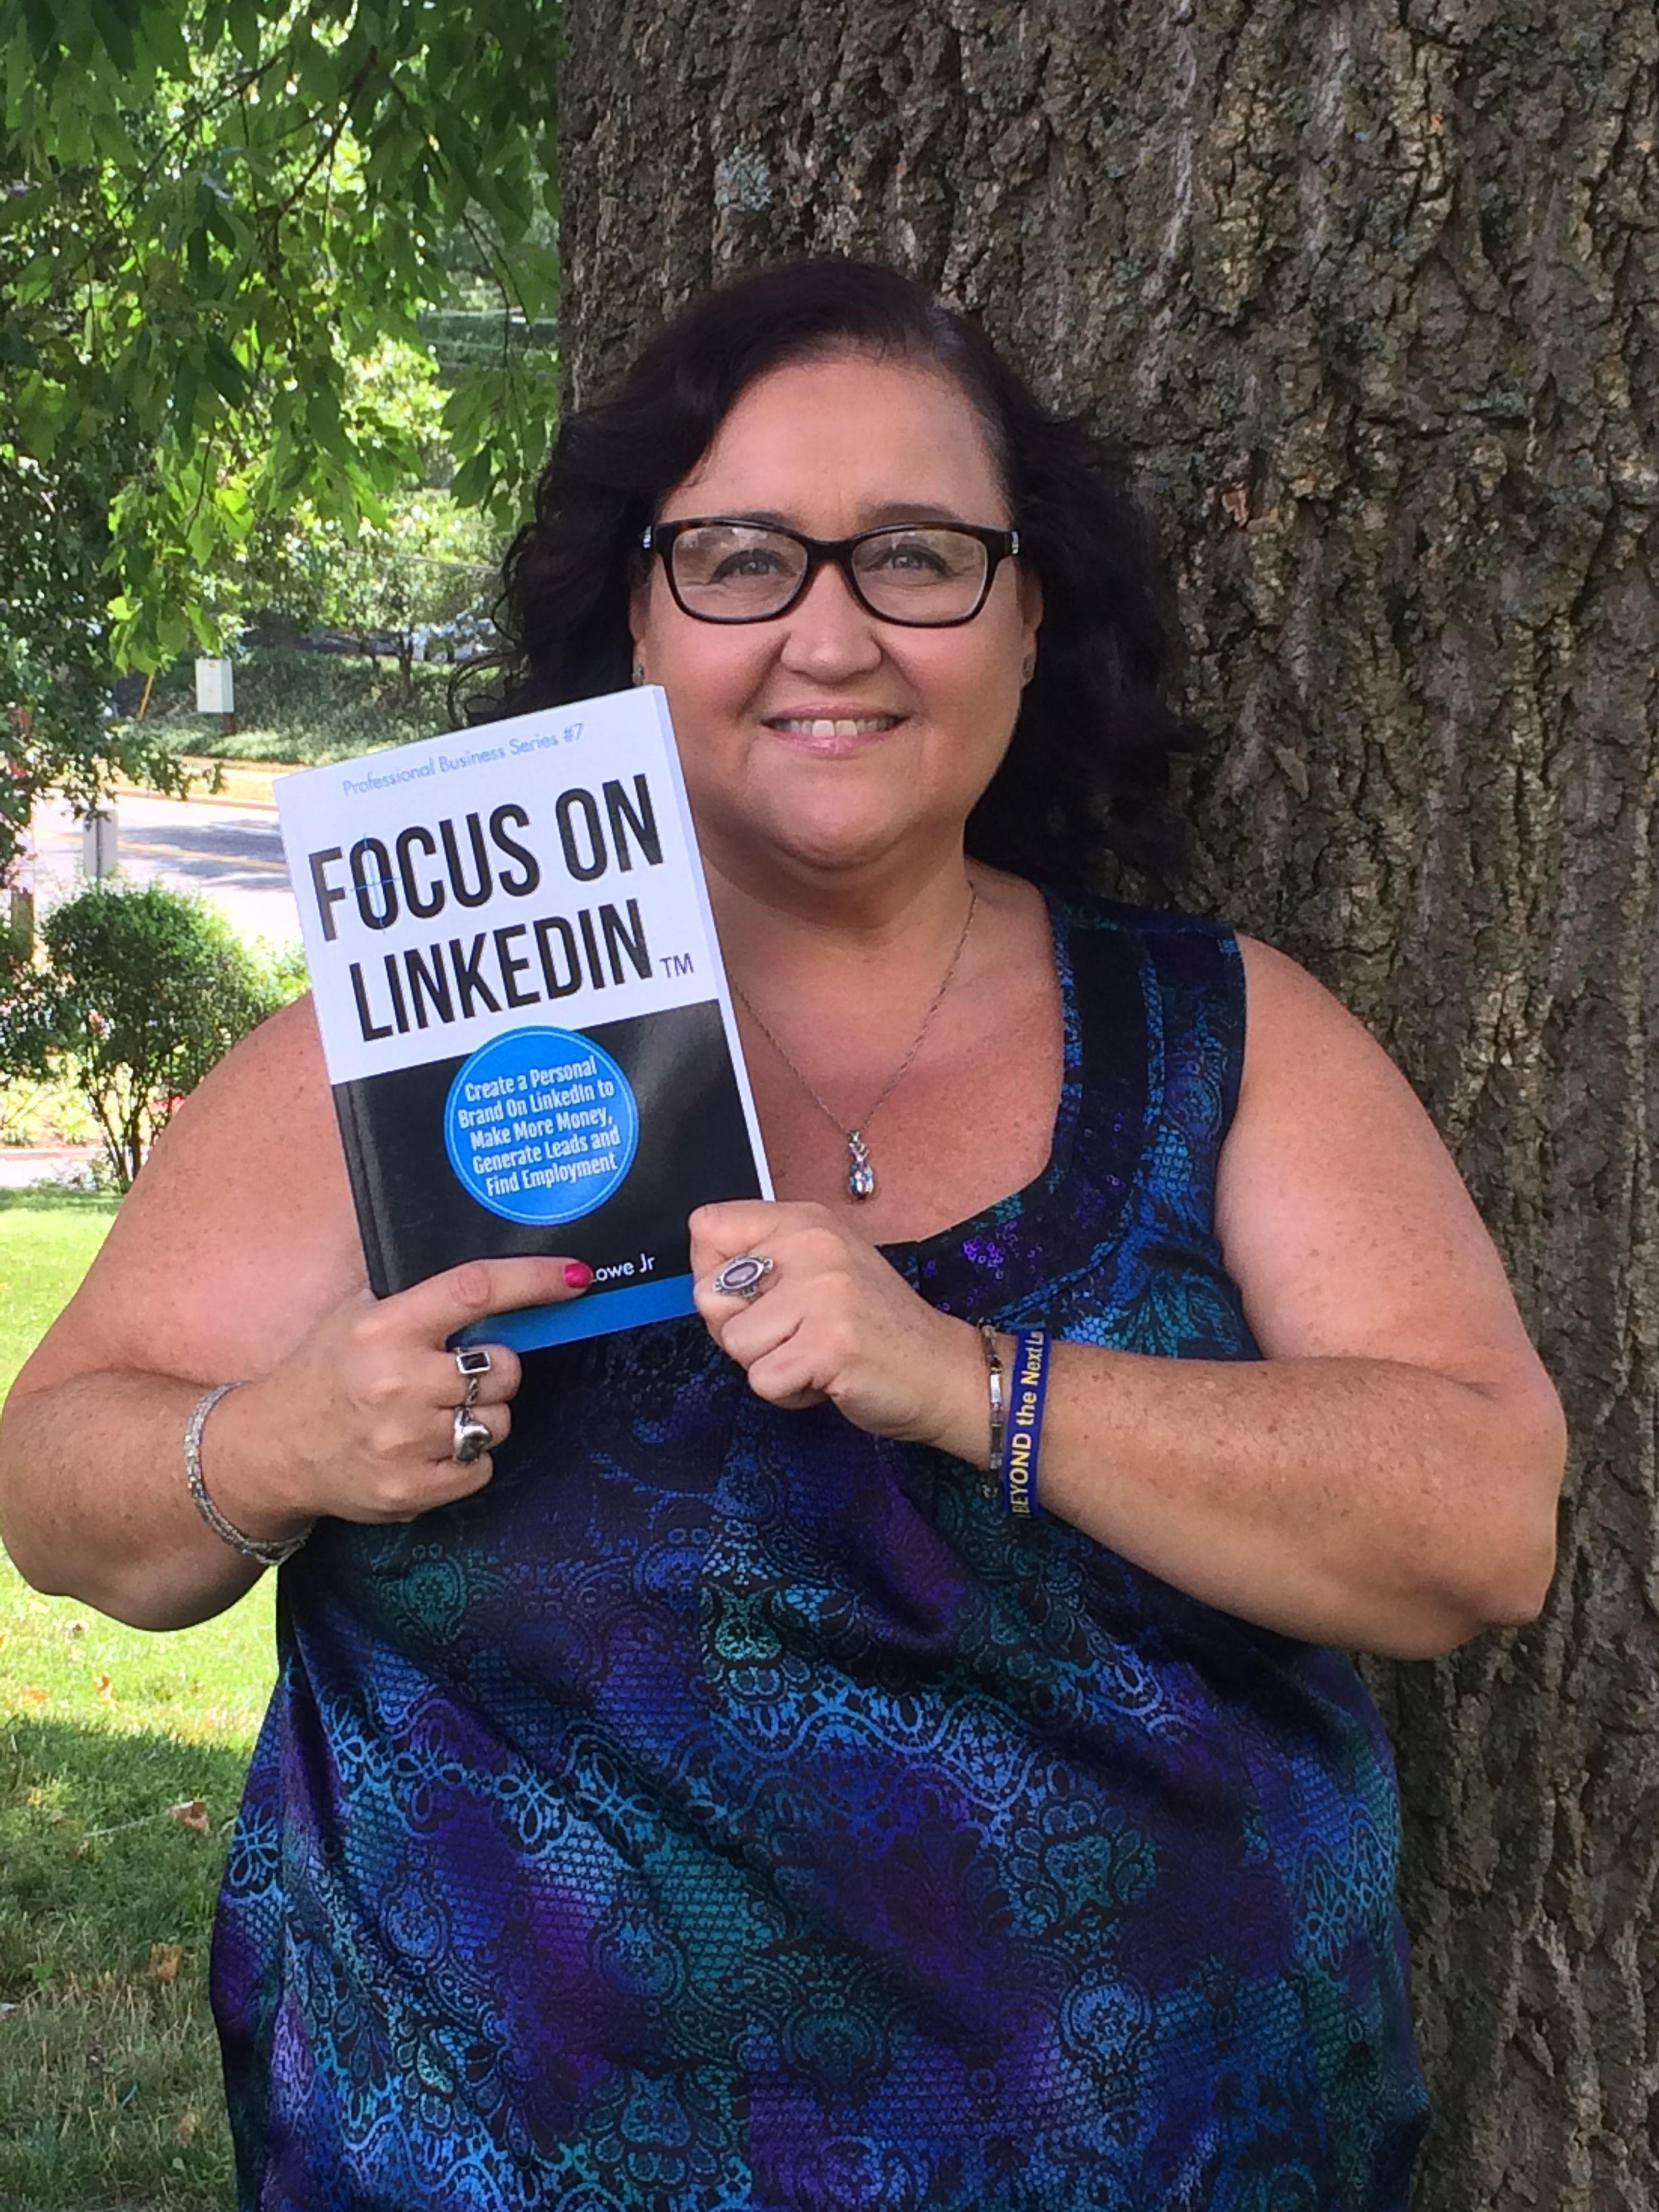 Sandra with Focus on Linkedin